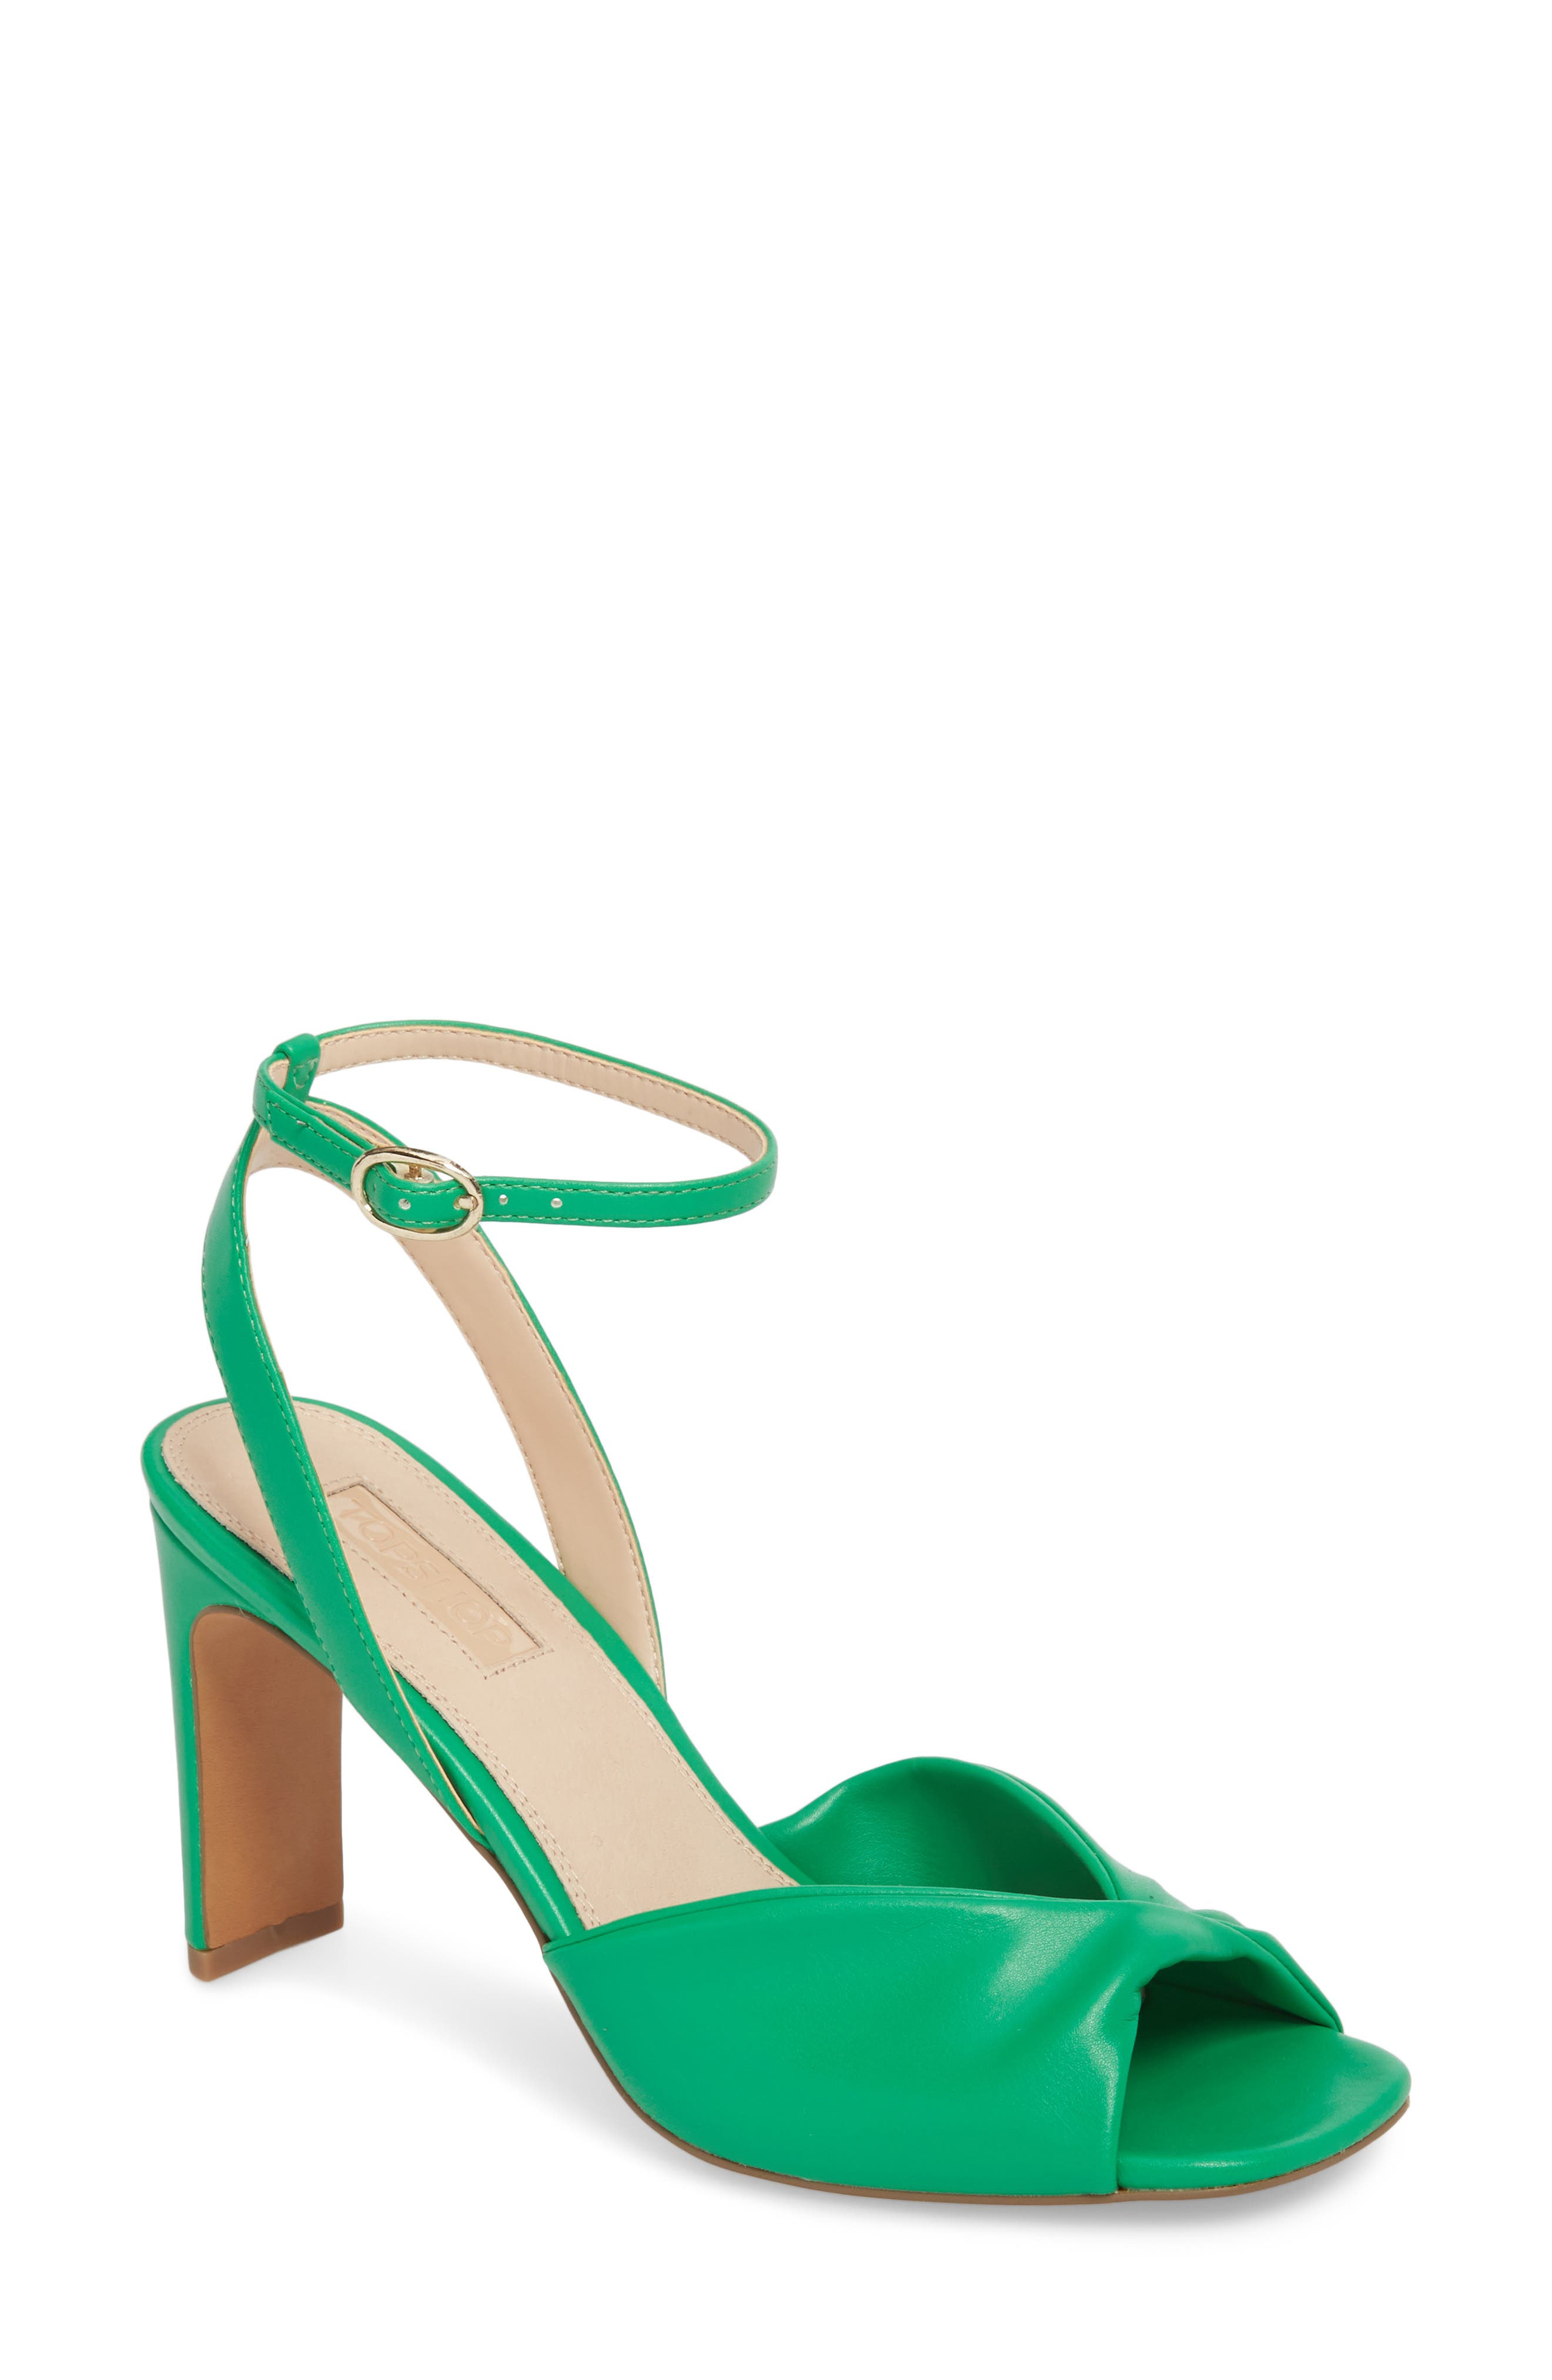 Raven Skinny Heel Sandal,                             Main thumbnail 1, color,                             Green